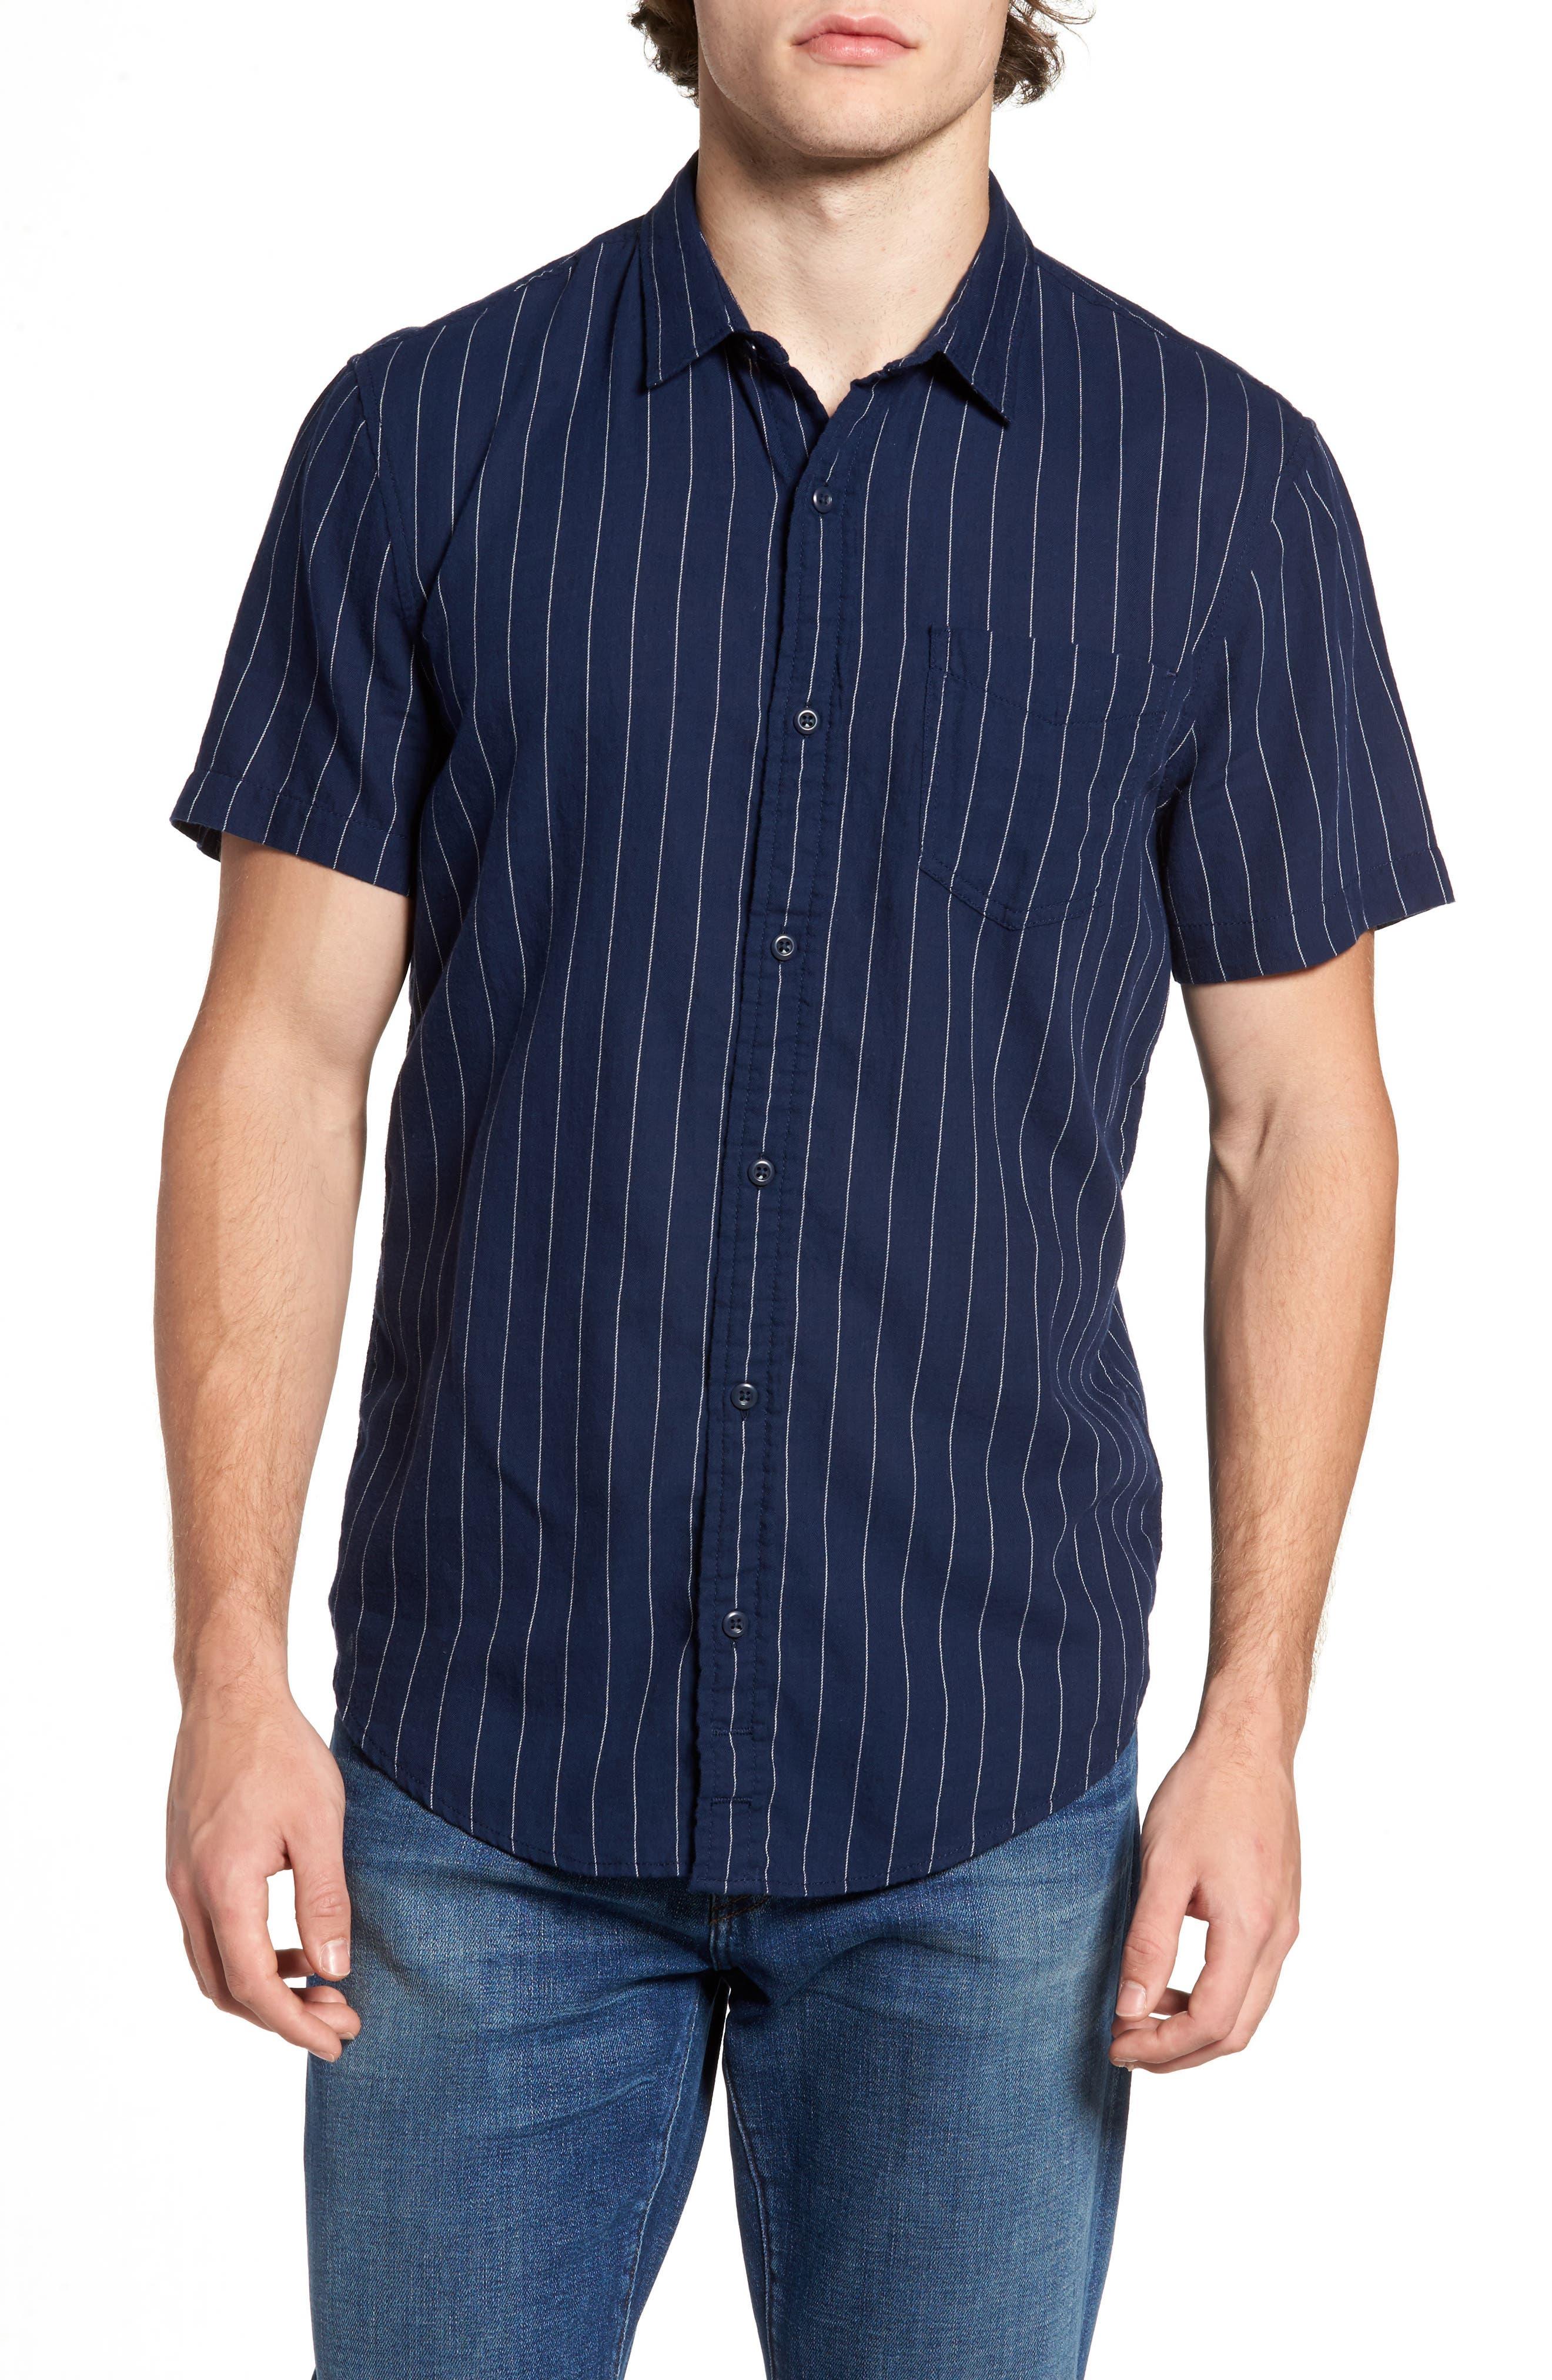 1901 Stripe Twill Shirt